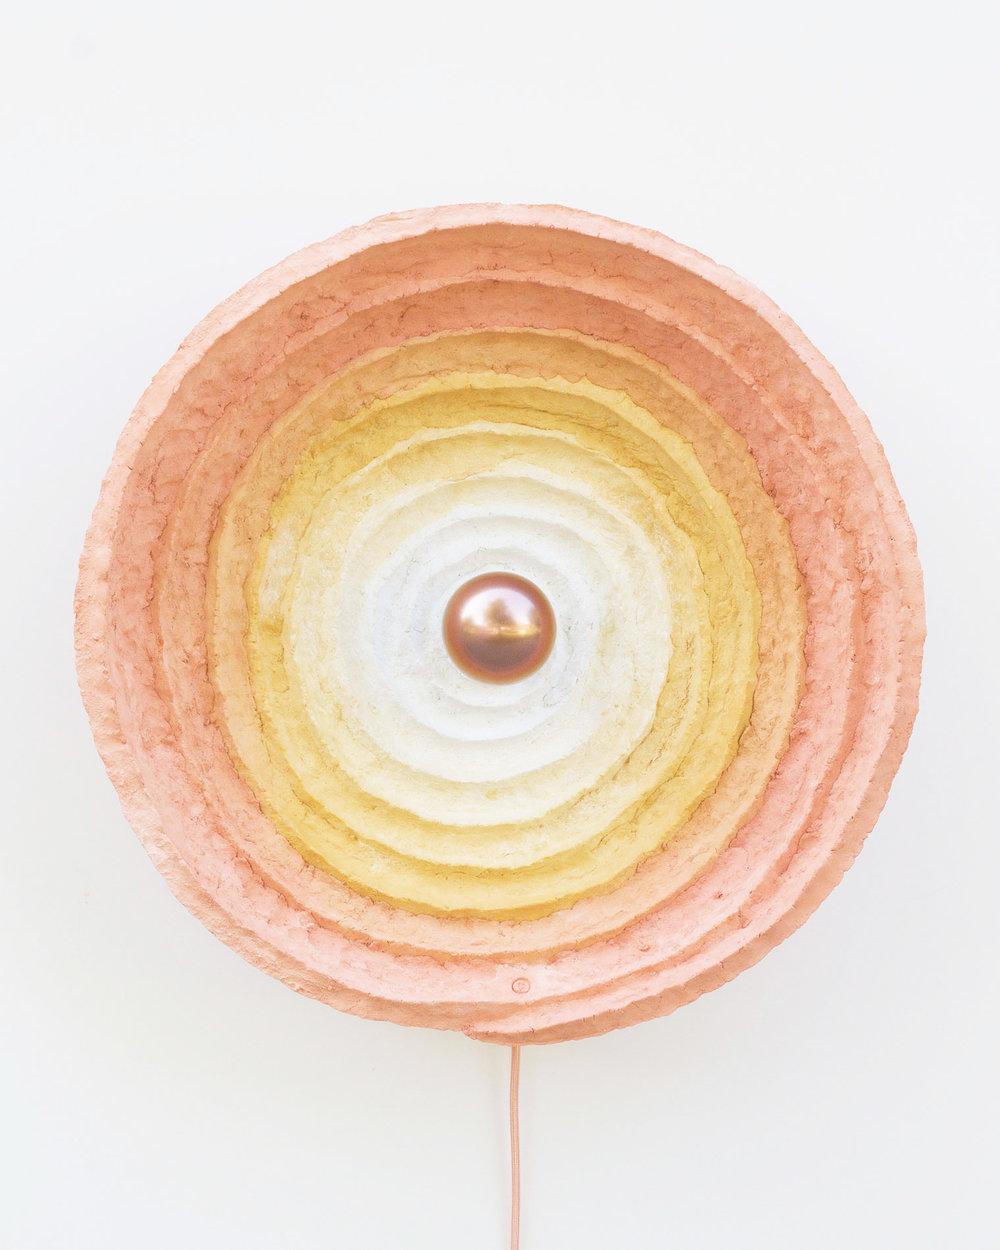 sunspiral-front-off.jpg